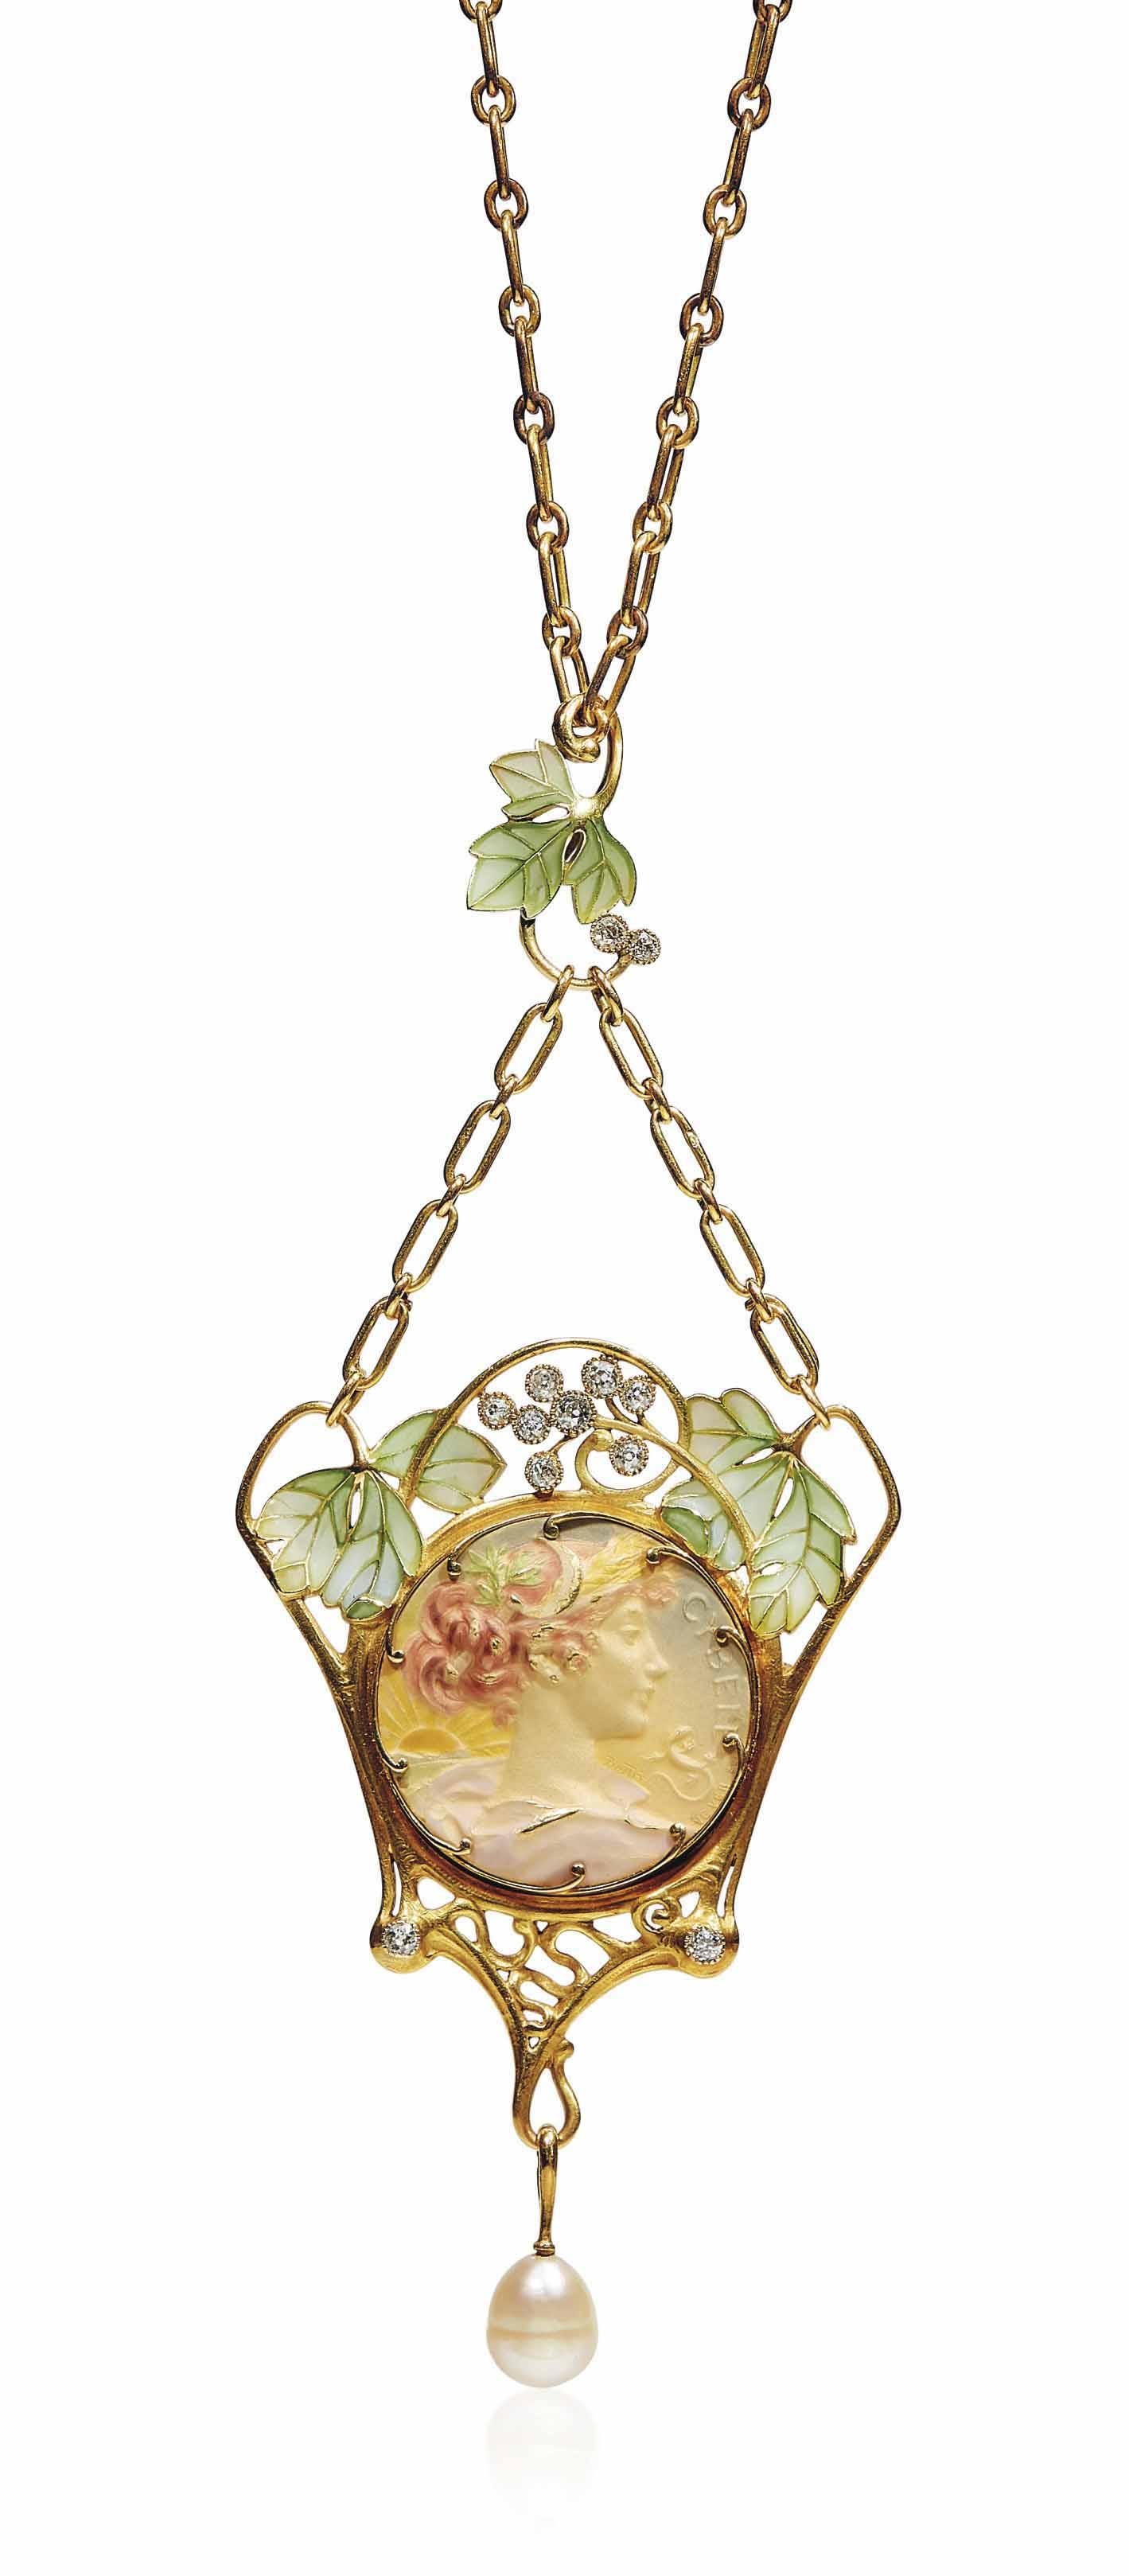 AN ART NOUVEAU ENAMEL, DIAMOND AND PEARL PENDENT NECKLACE, BY HENRI VEVER